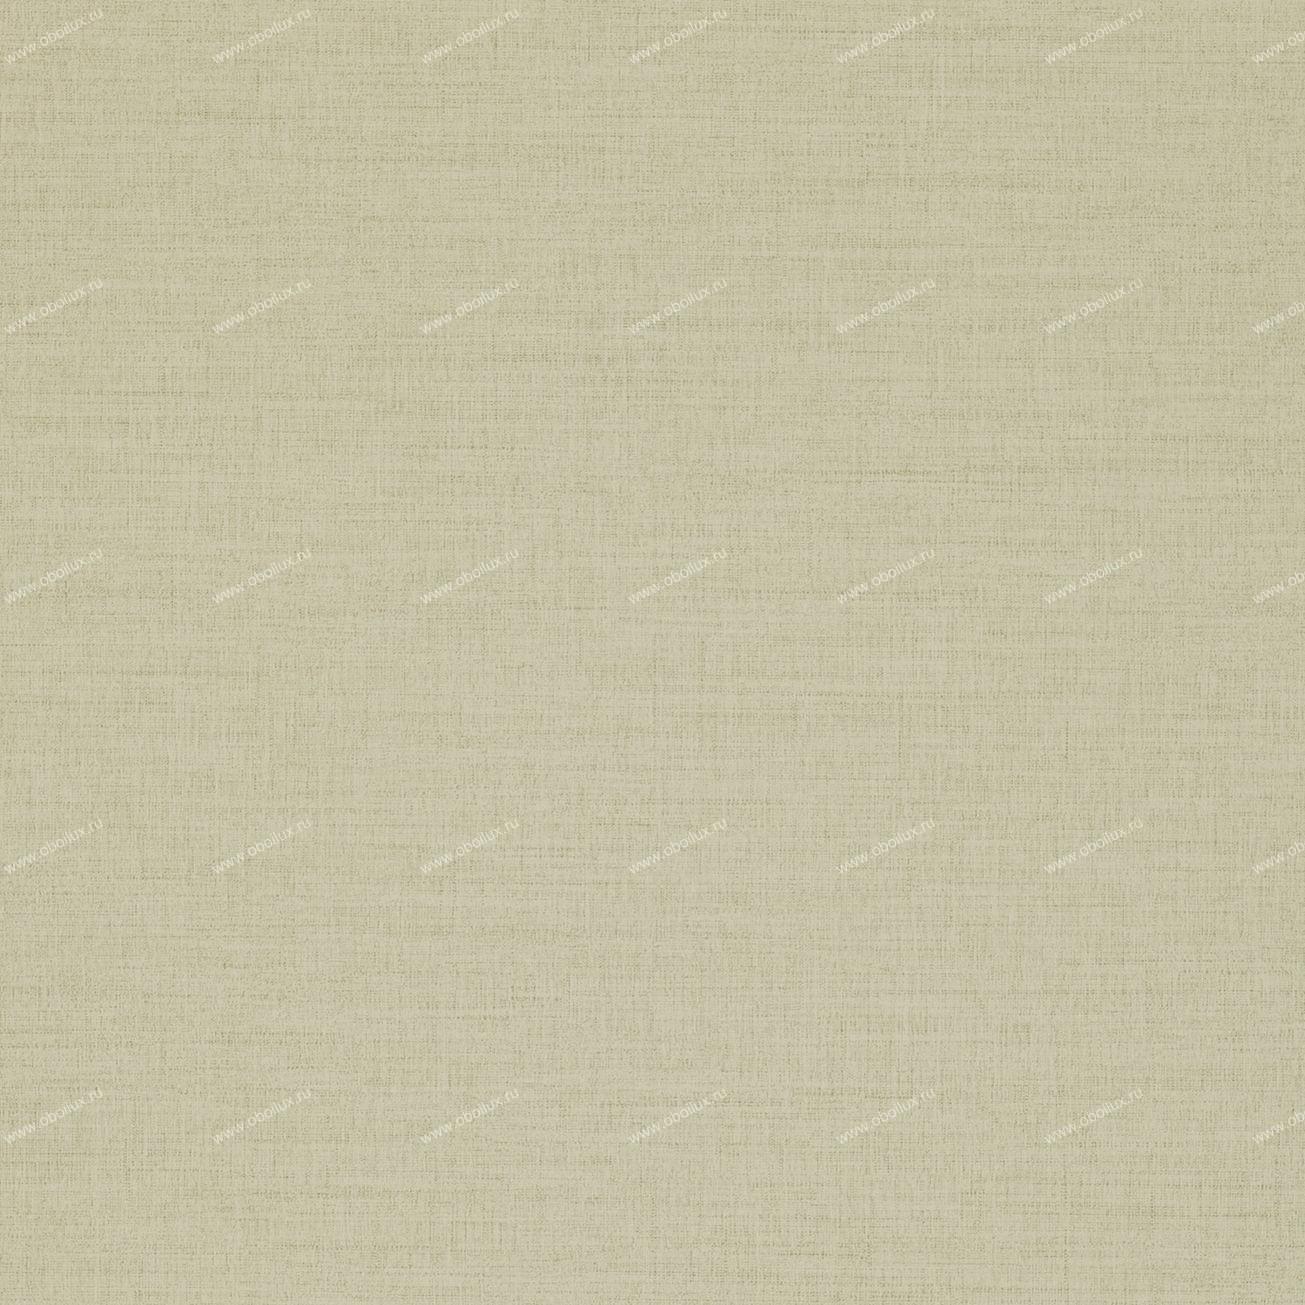 Английские обои Sanderson,  коллекция Colour for Living, артикул211679